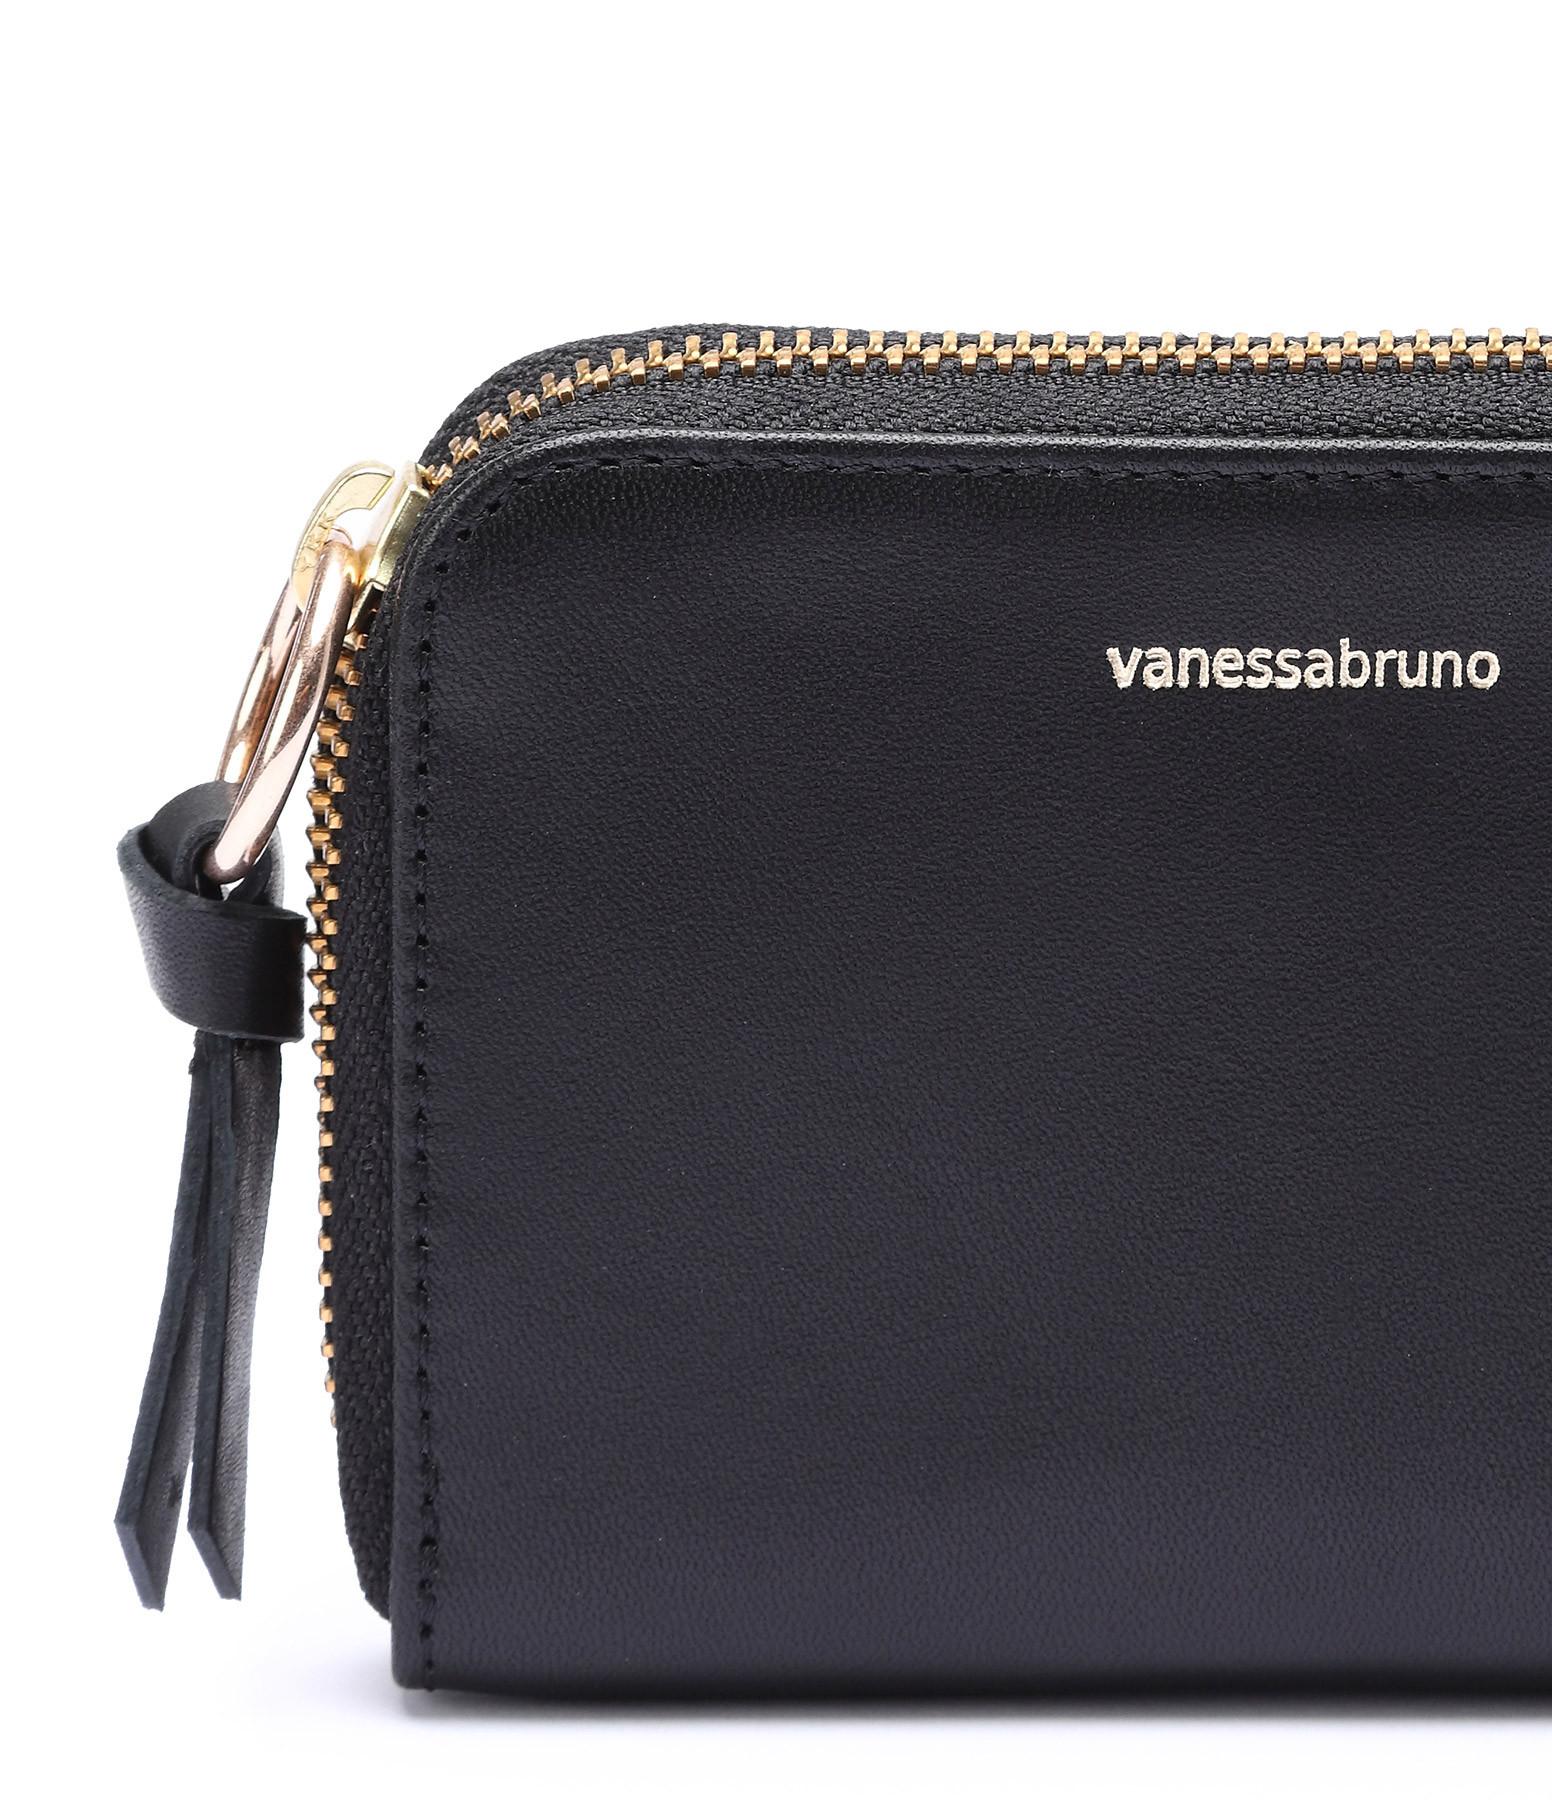 VANESSA BRUNO - Porte-monnaie Charly PM Cuir Noir